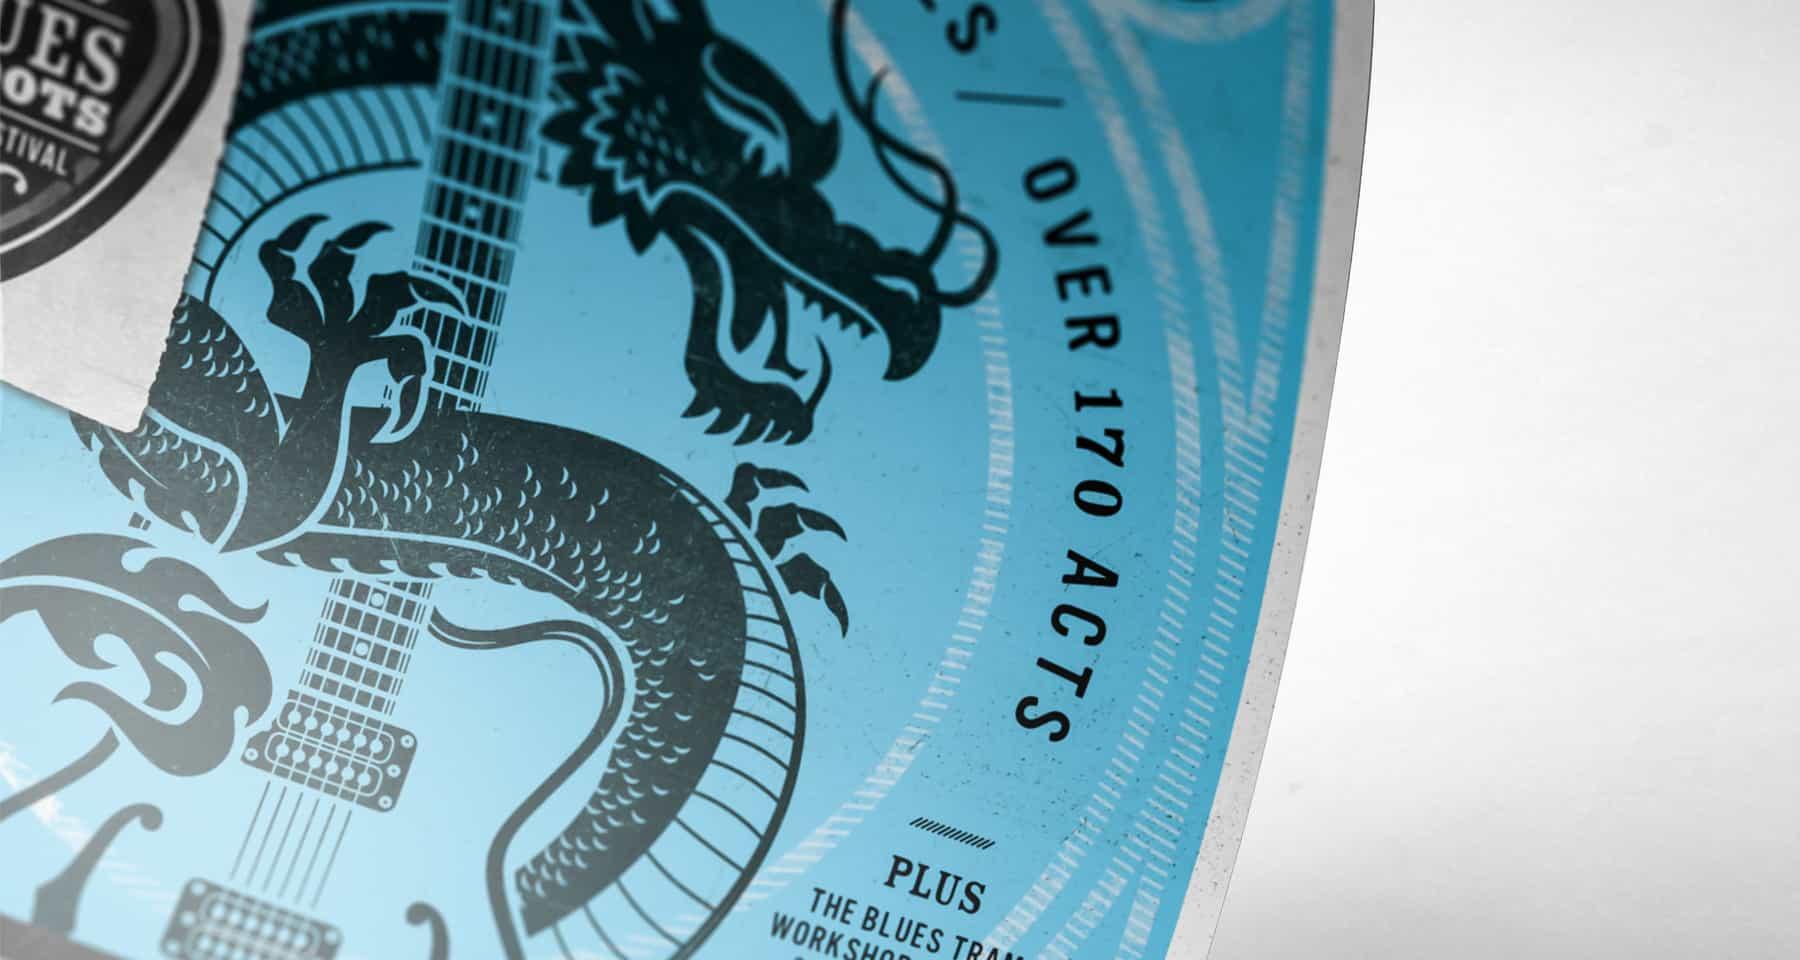 Bendigo Blues & Roots Music Festival Design